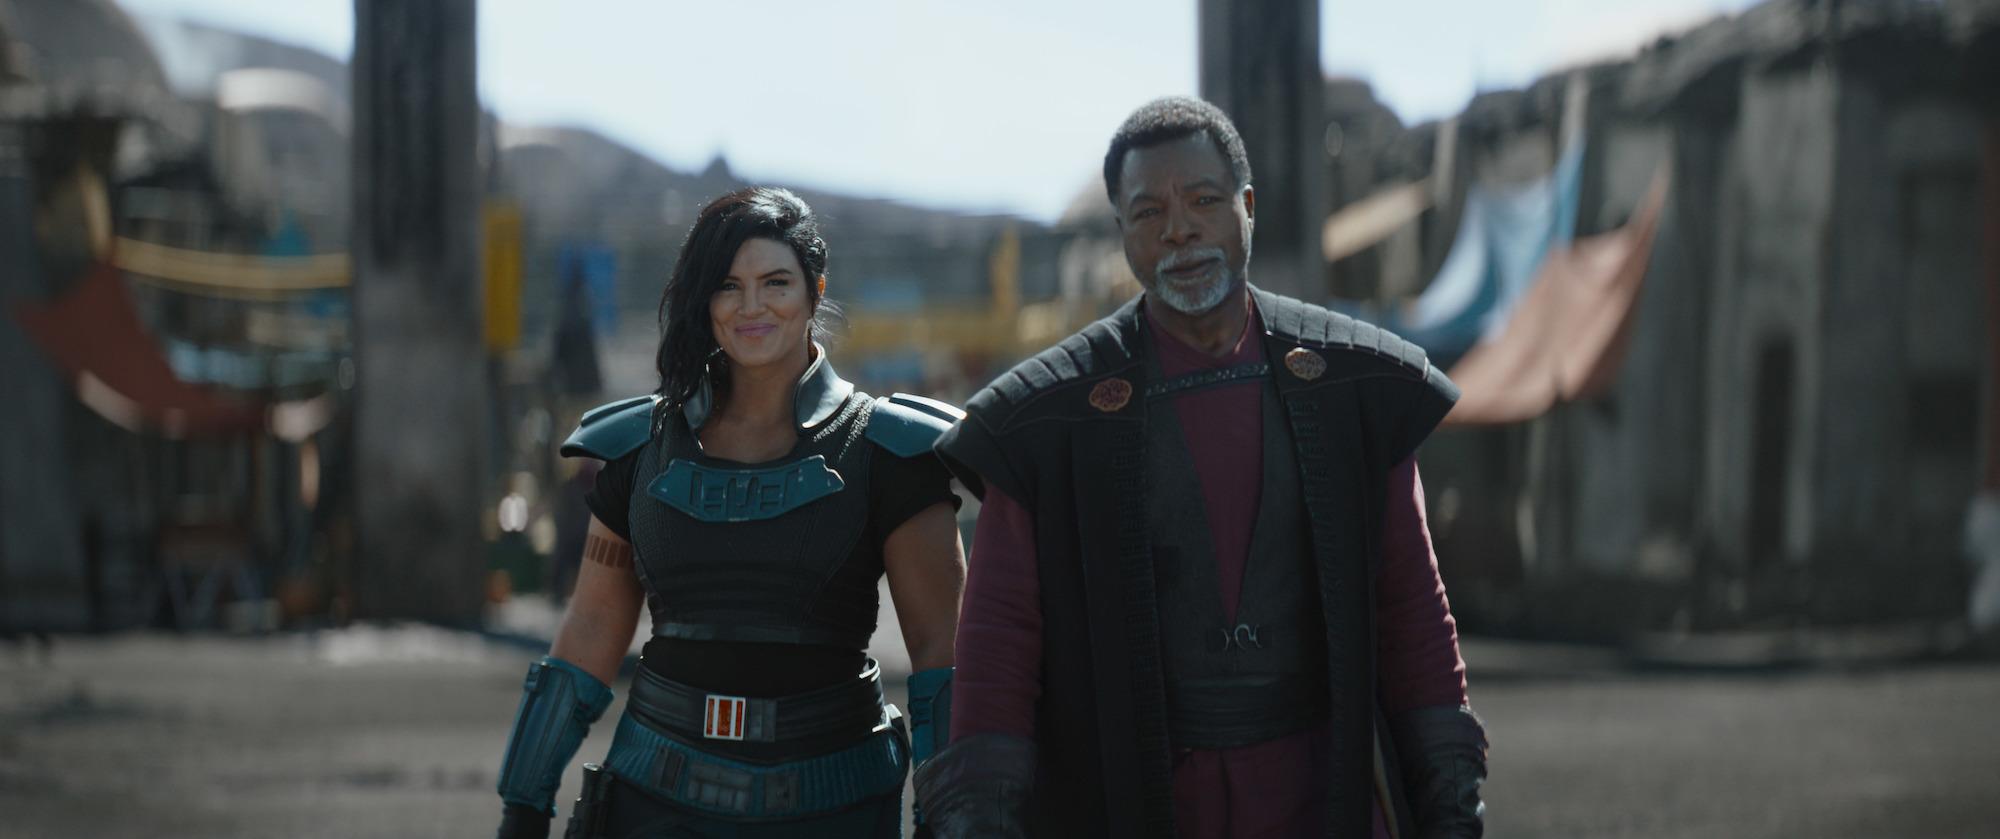 Cara Dune and Greef Karga in 'The Mandalorian' Episode 4, Season 2.